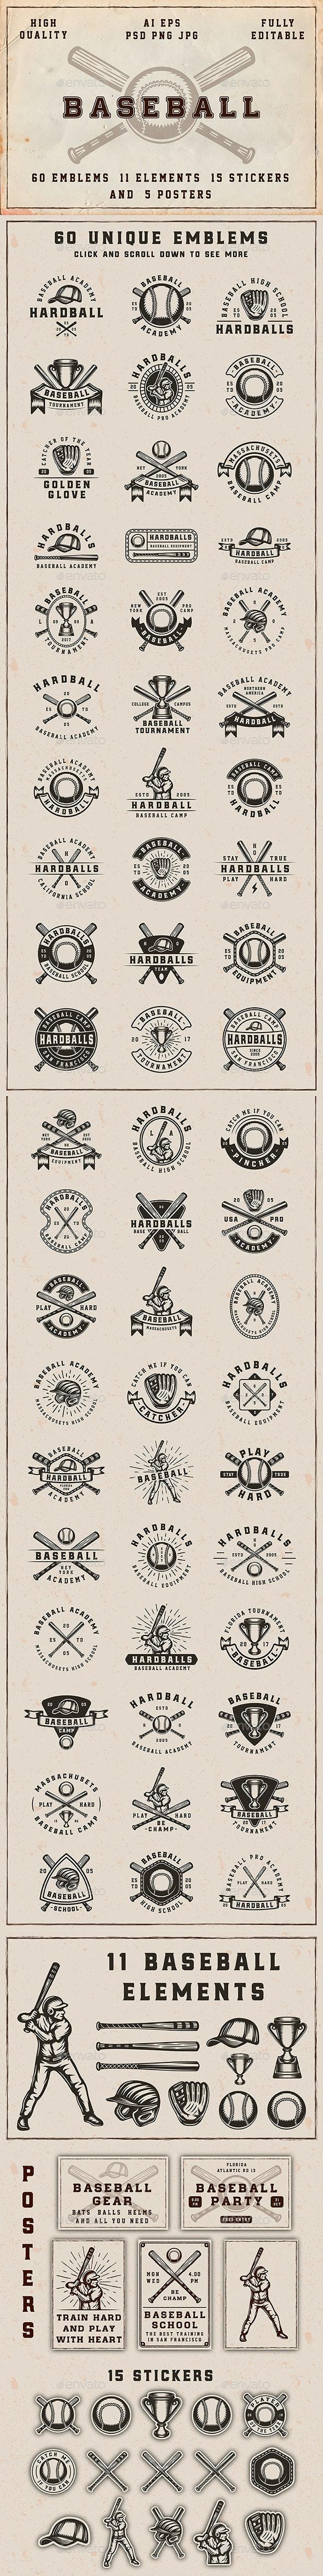 Vintage Baseball Emblems - Badges & Stickers Web Elements